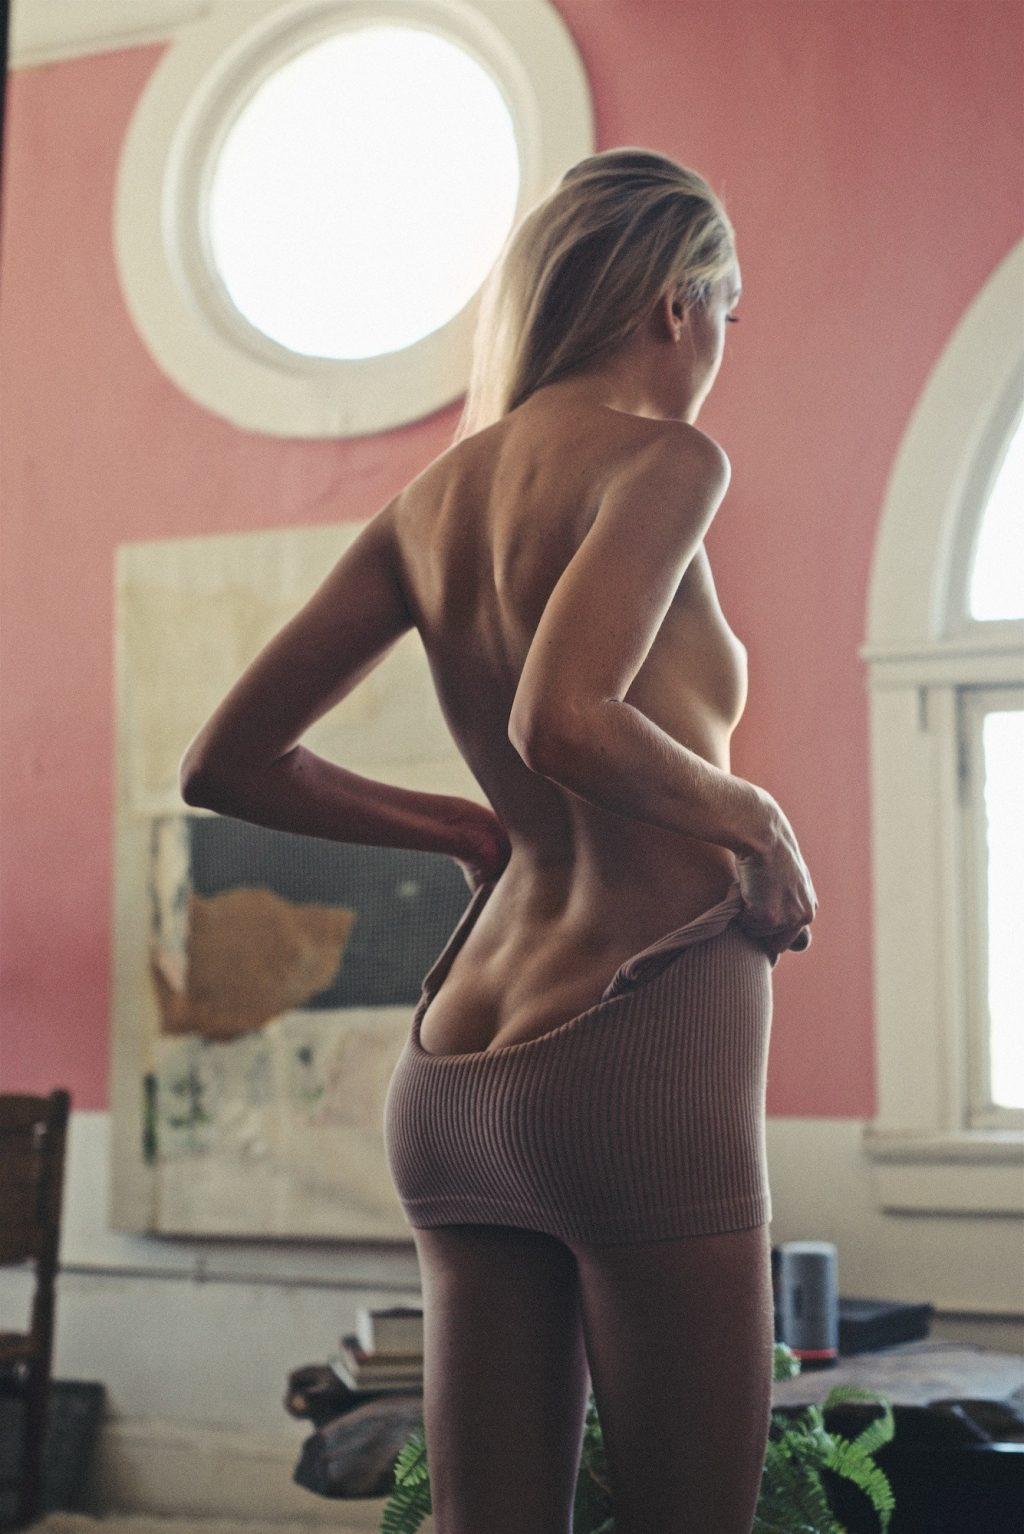 Porno Jasmine Shogren naked (47 photos), Topless, Paparazzi, Feet, see through 2018